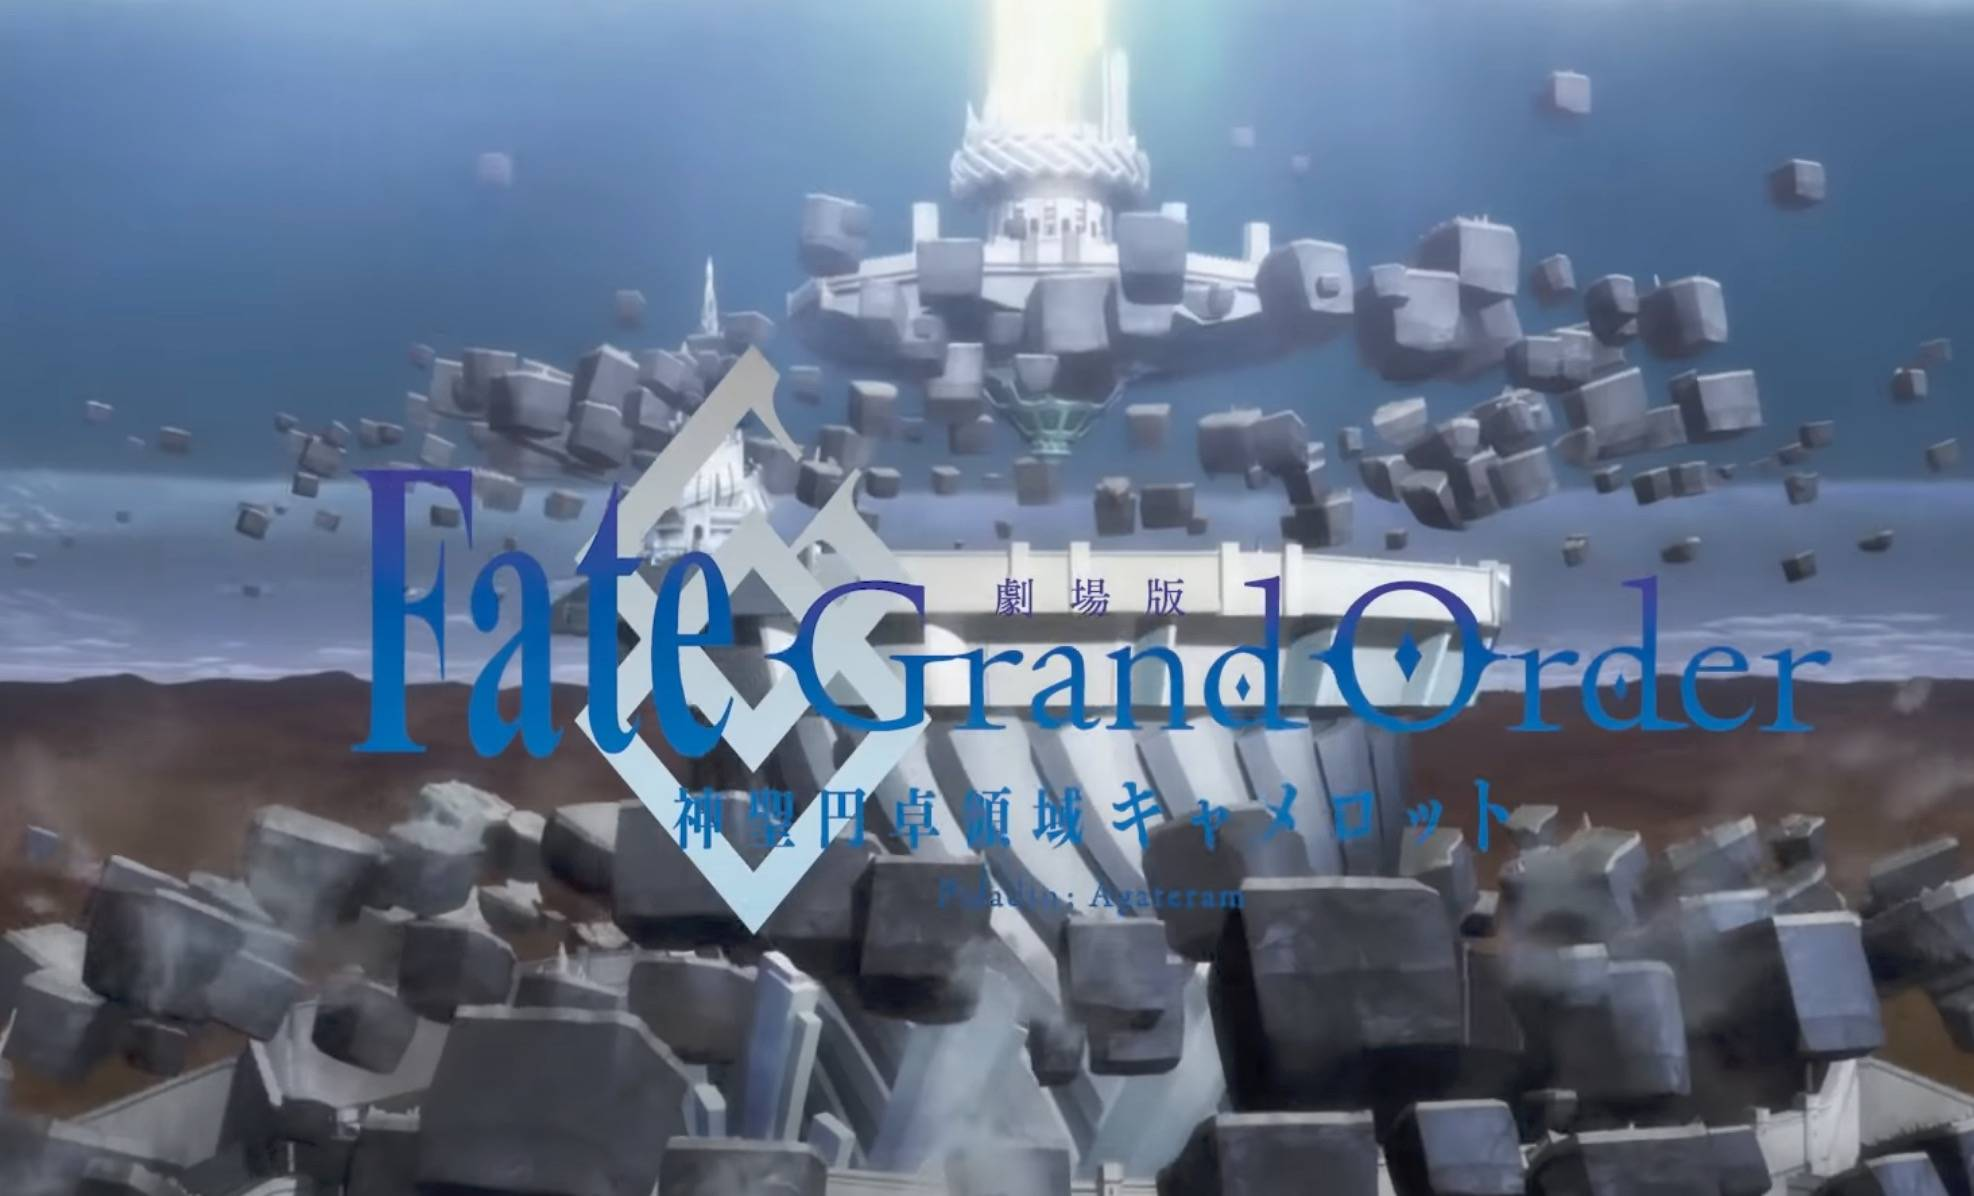 《Fate/Grand Order 神圣圆桌领域 卡美洛》下半段的剧场版火热放映 剧本安排毫无亮点